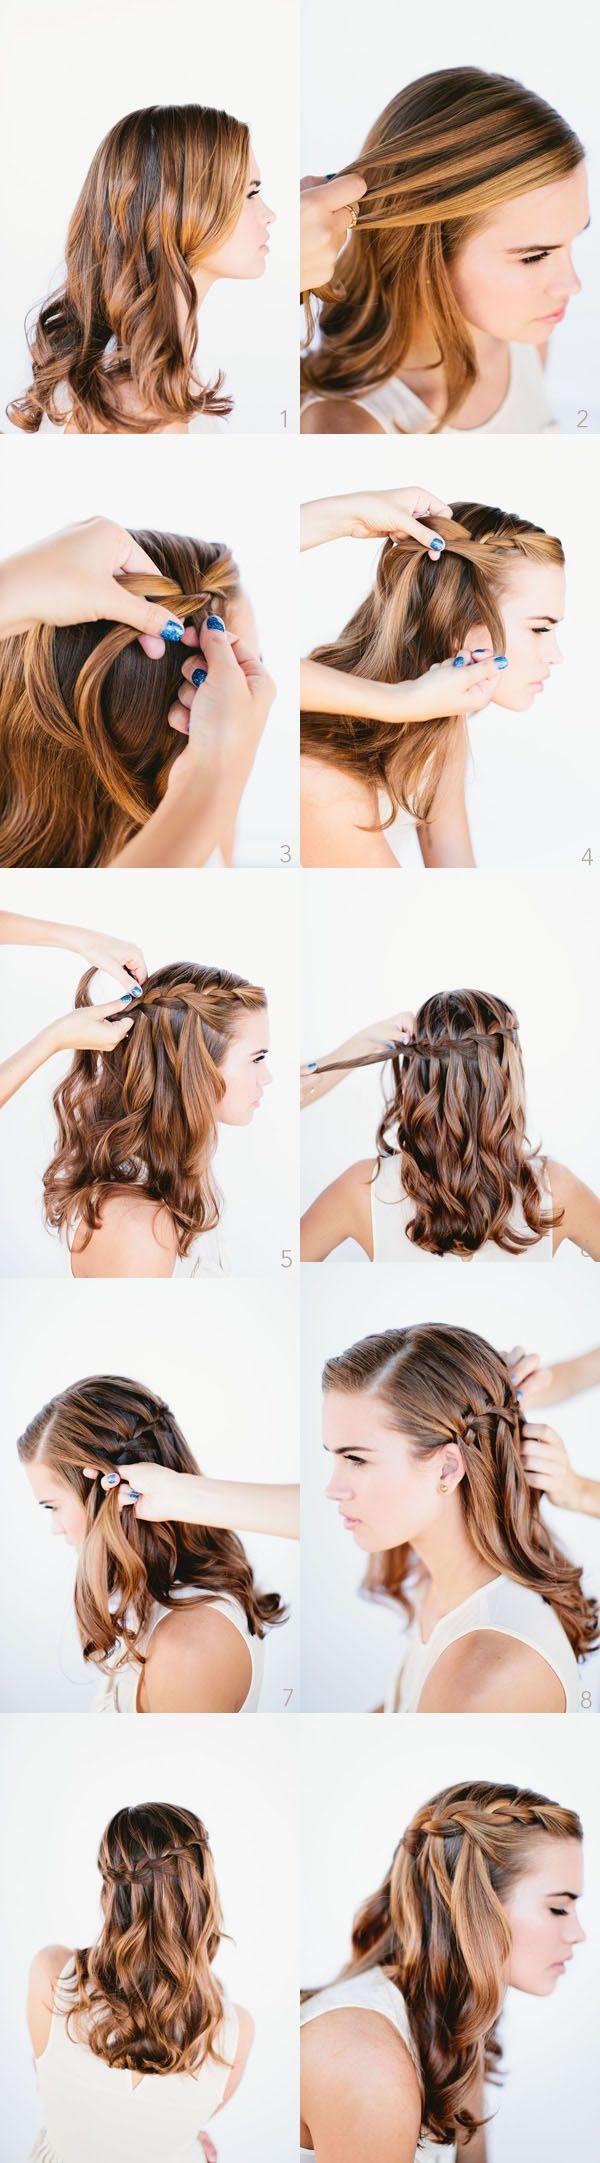 romantic braided hairstyles with useful tutorials braid hair